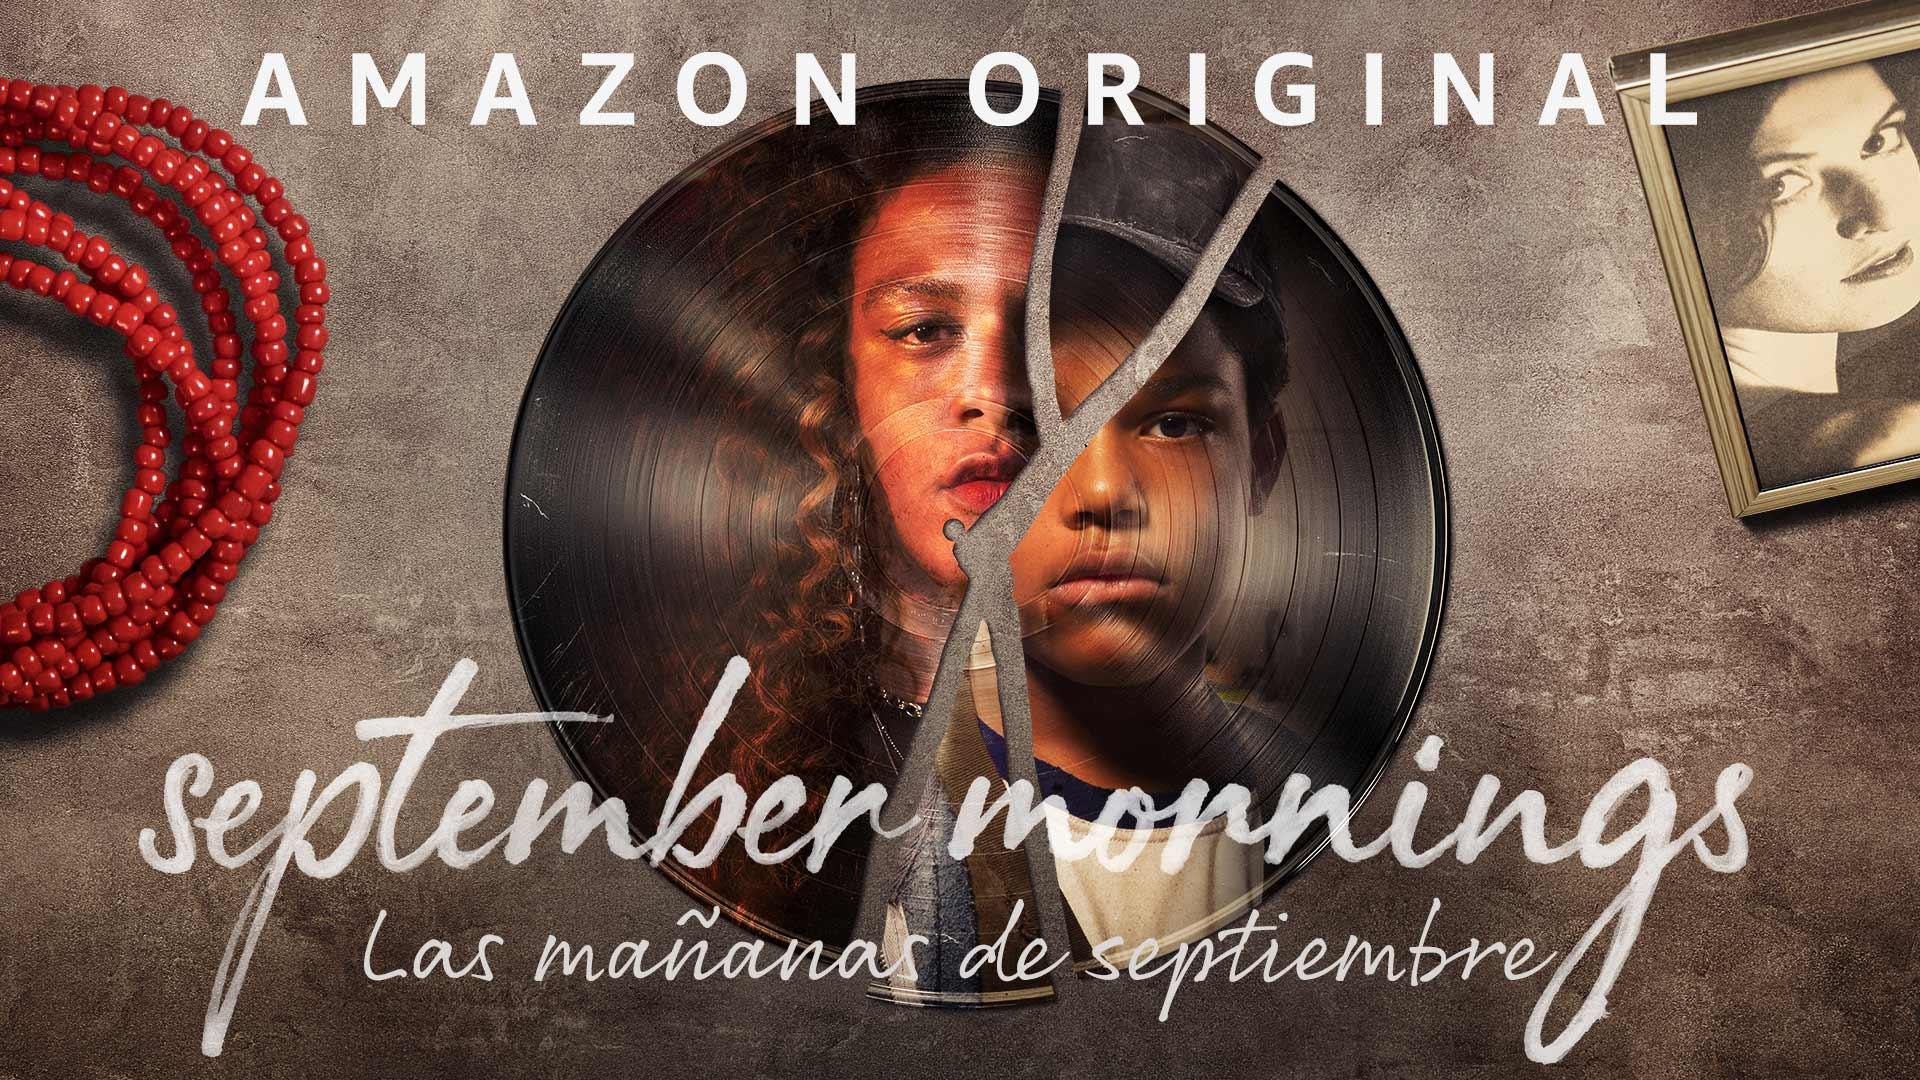 September Mornings: Las mañanas de septiembre - Temporada 1